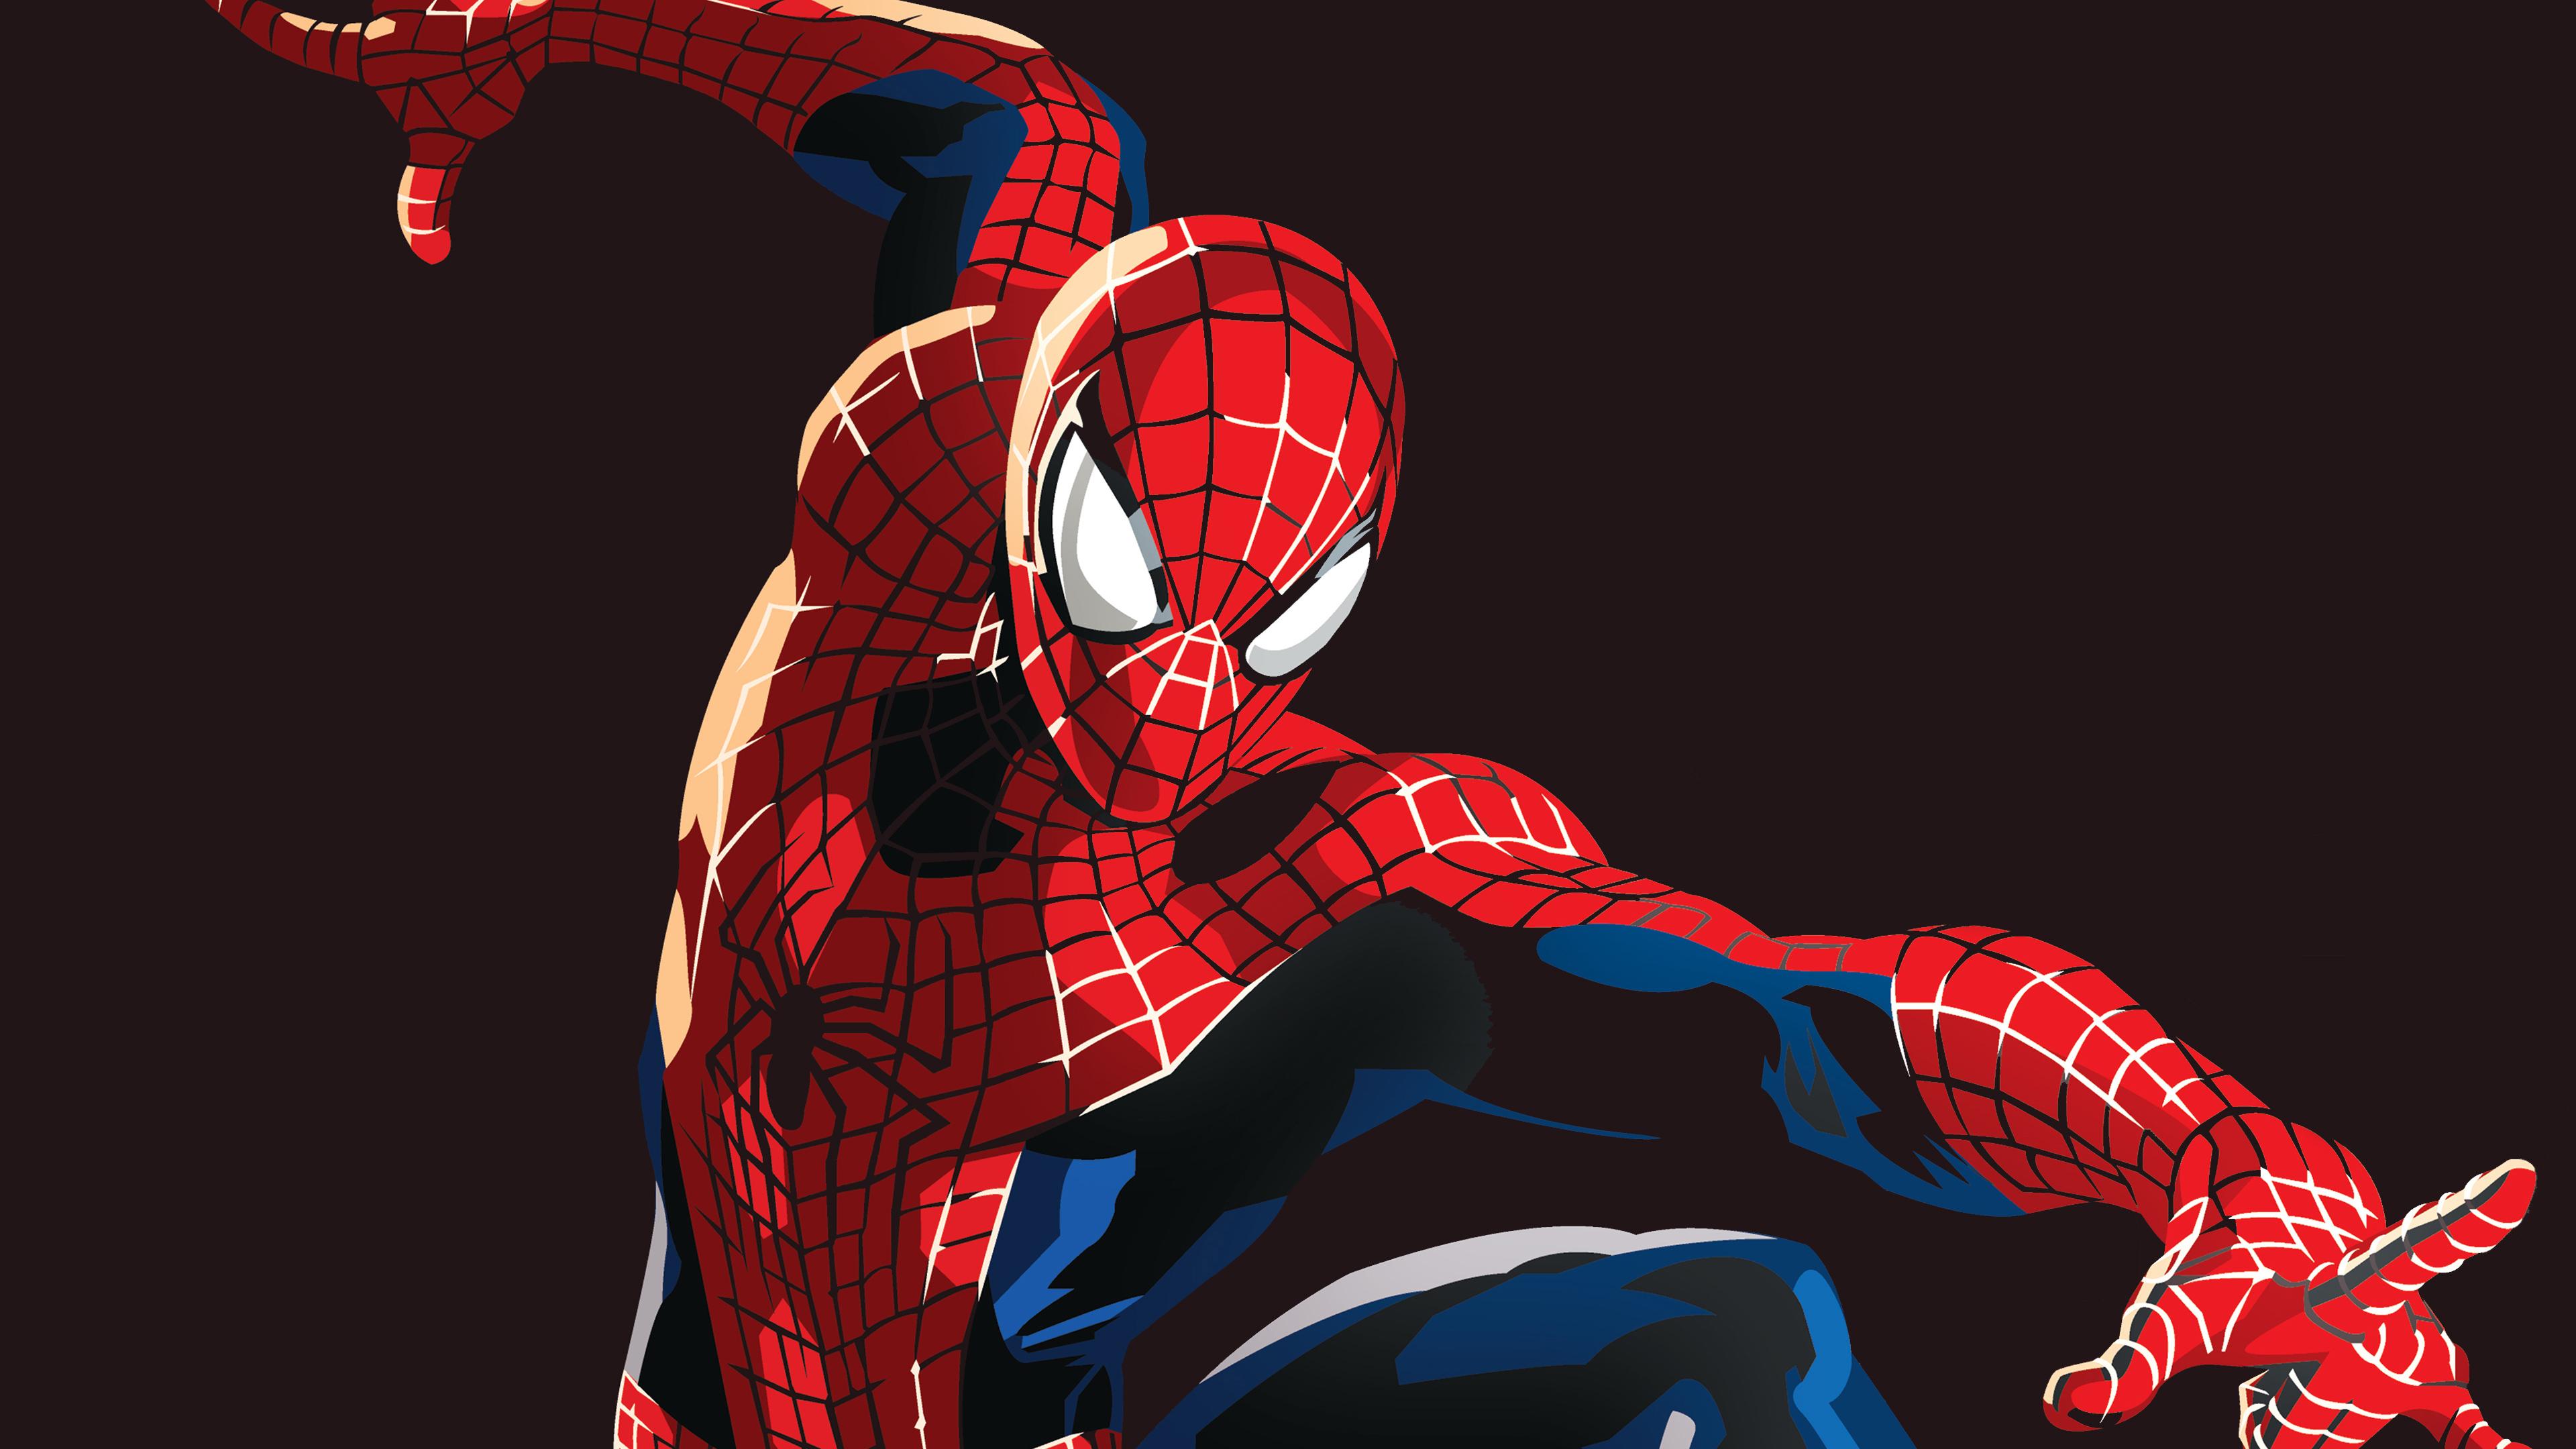 spiderman graphic 4k 1544286776 - Spiderman Graphic 4k - superheroes wallpapers, spiderman wallpapers, hd-wallpapers, digital art wallpapers, behance wallpapers, artwork wallpapers, art wallpapers, 4k-wallpapers